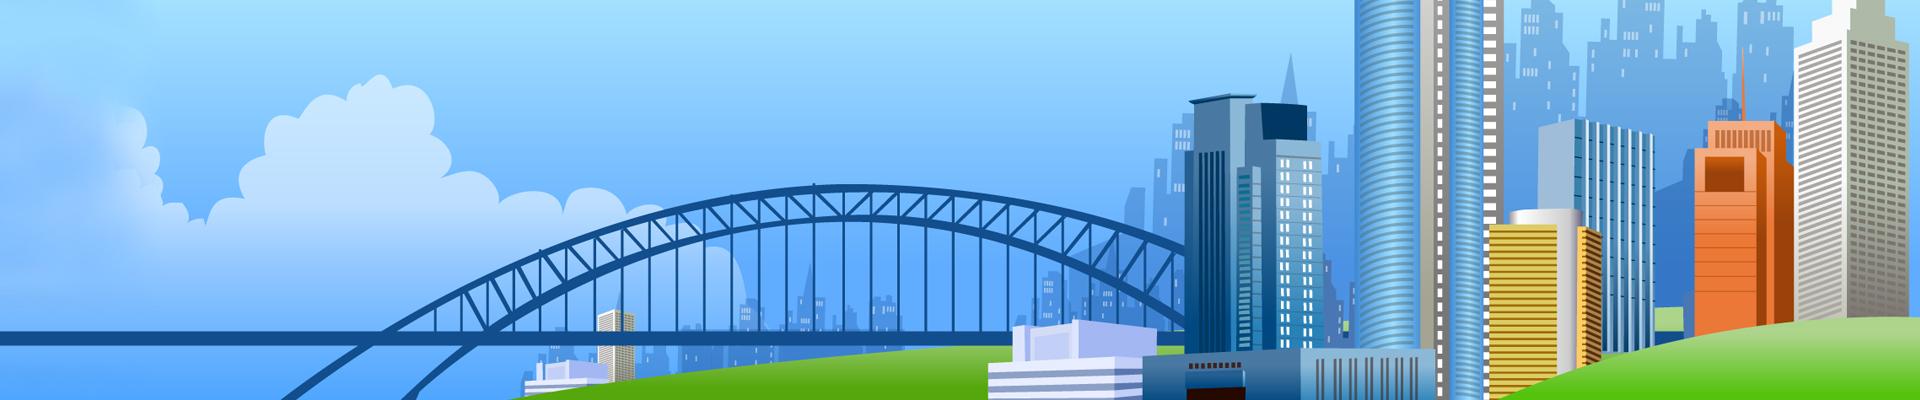 banner_city